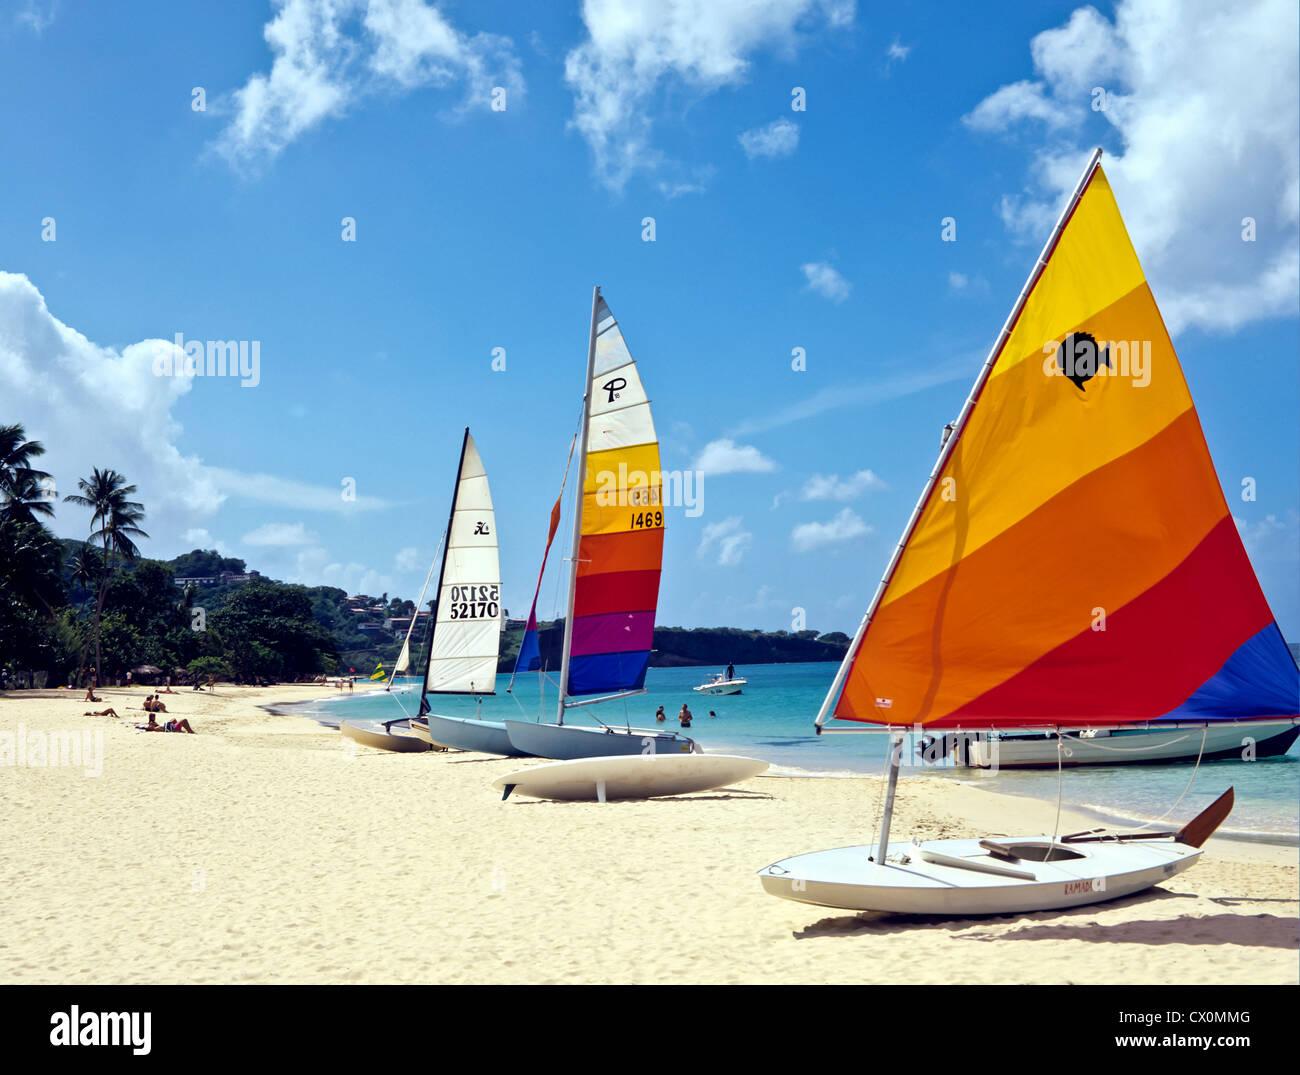 8202. Grand Anse, Grenada, Caribbean, West Indies Stock Photo